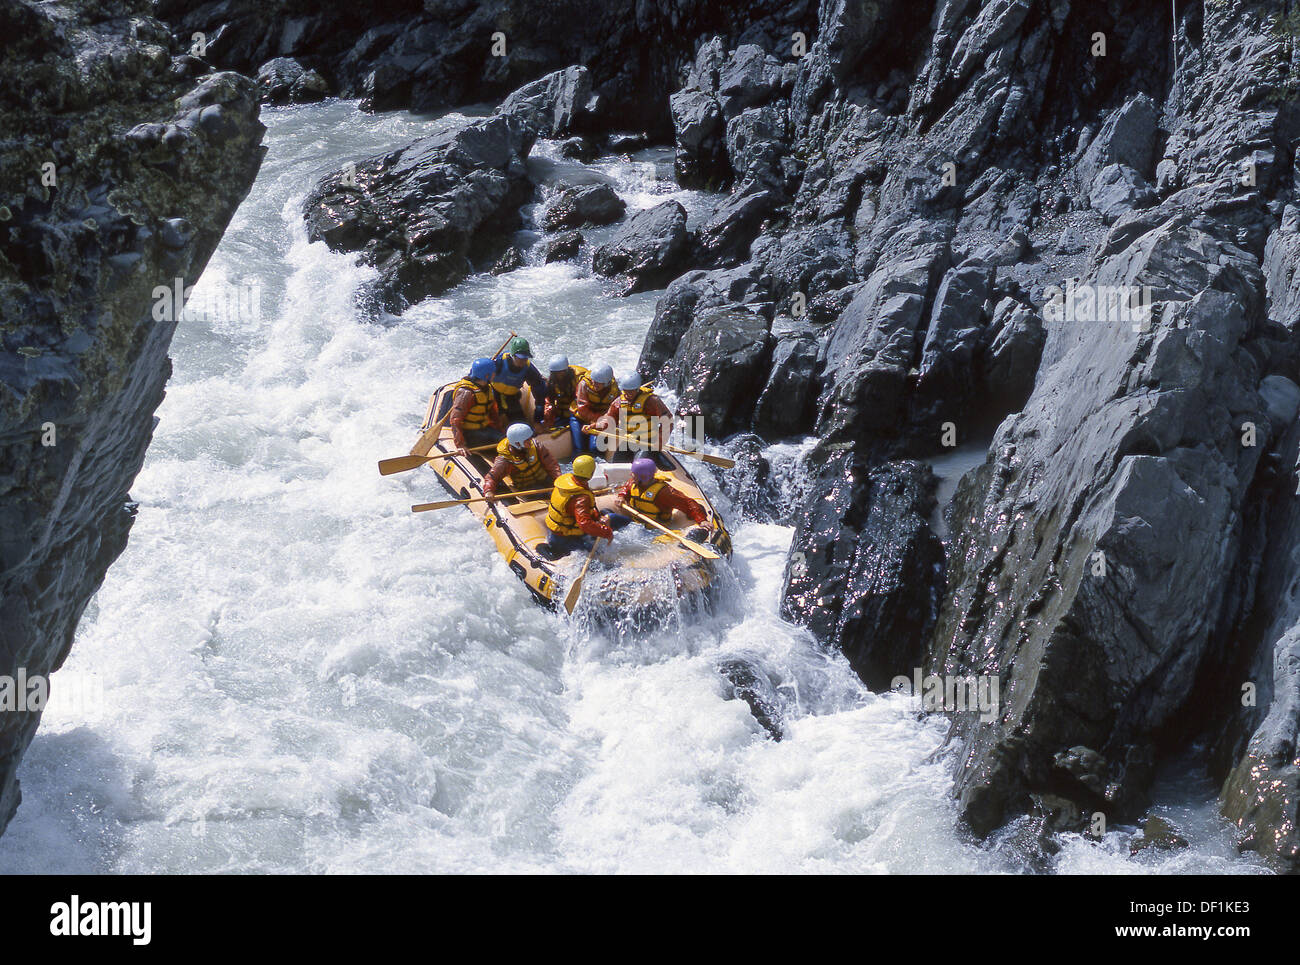 Tricky navigation whitewater rafting Rangitata River Canterbury New Zealand - Stock Image